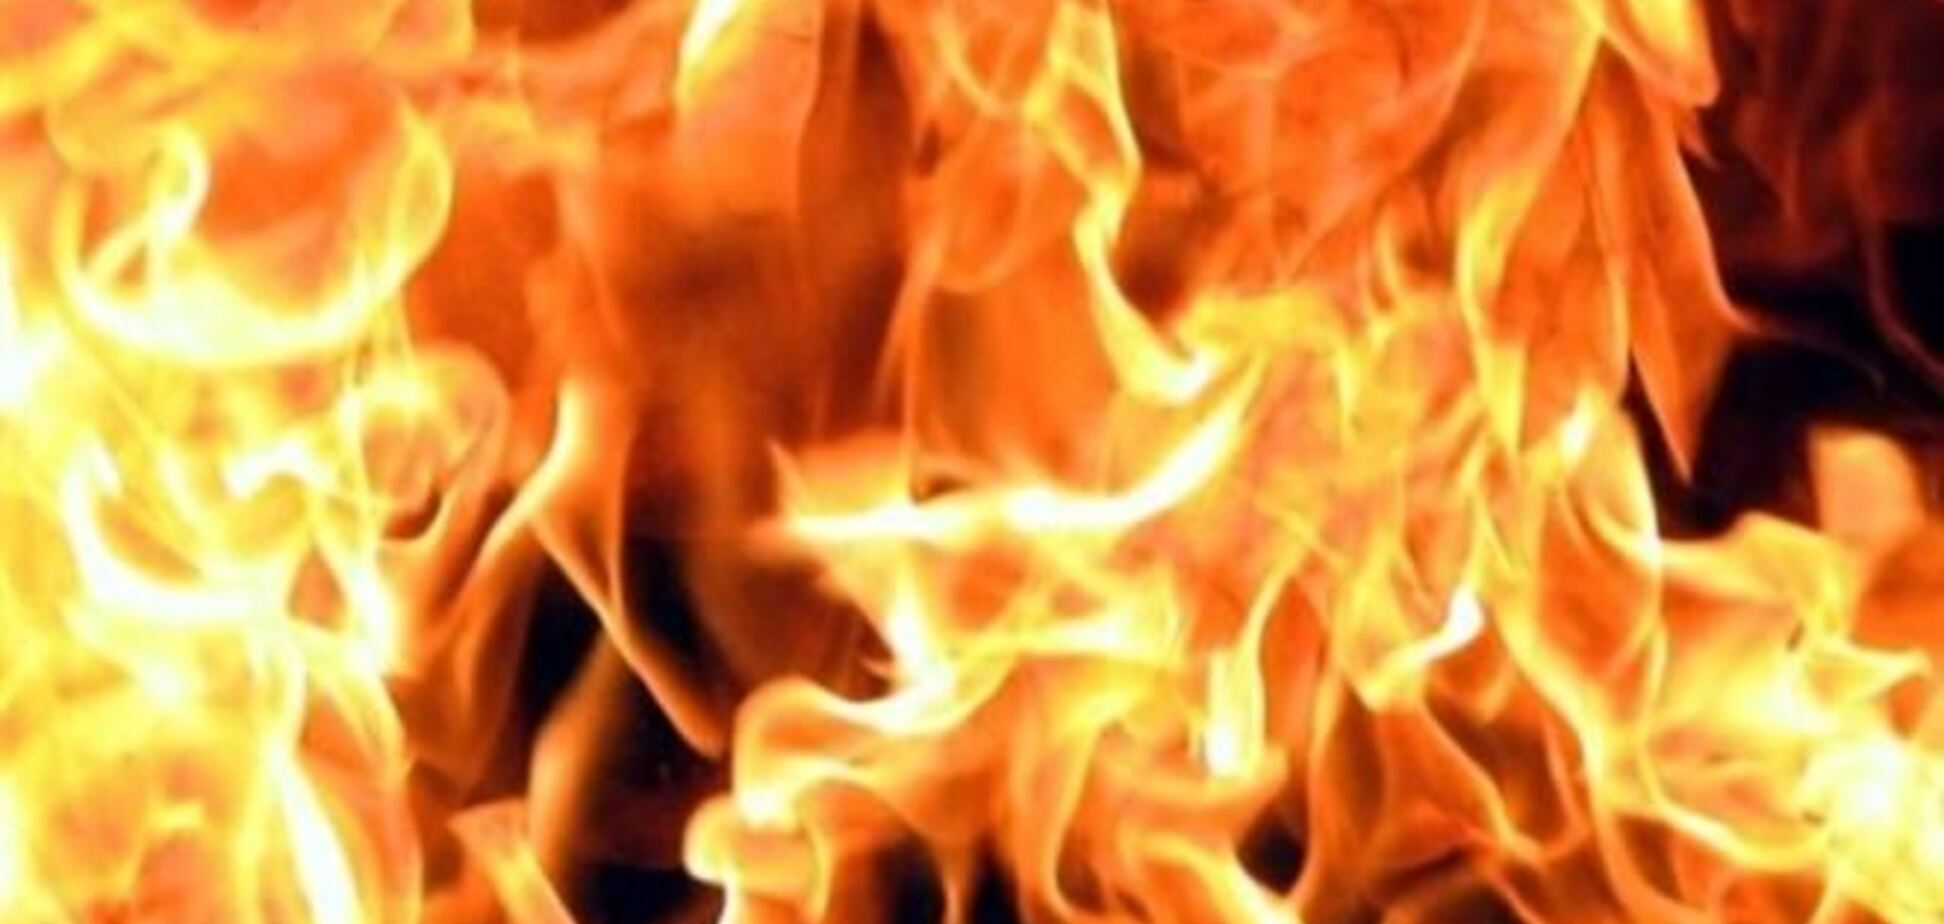 На Луганщине сгорел дом: судьба трех человек неизвестна